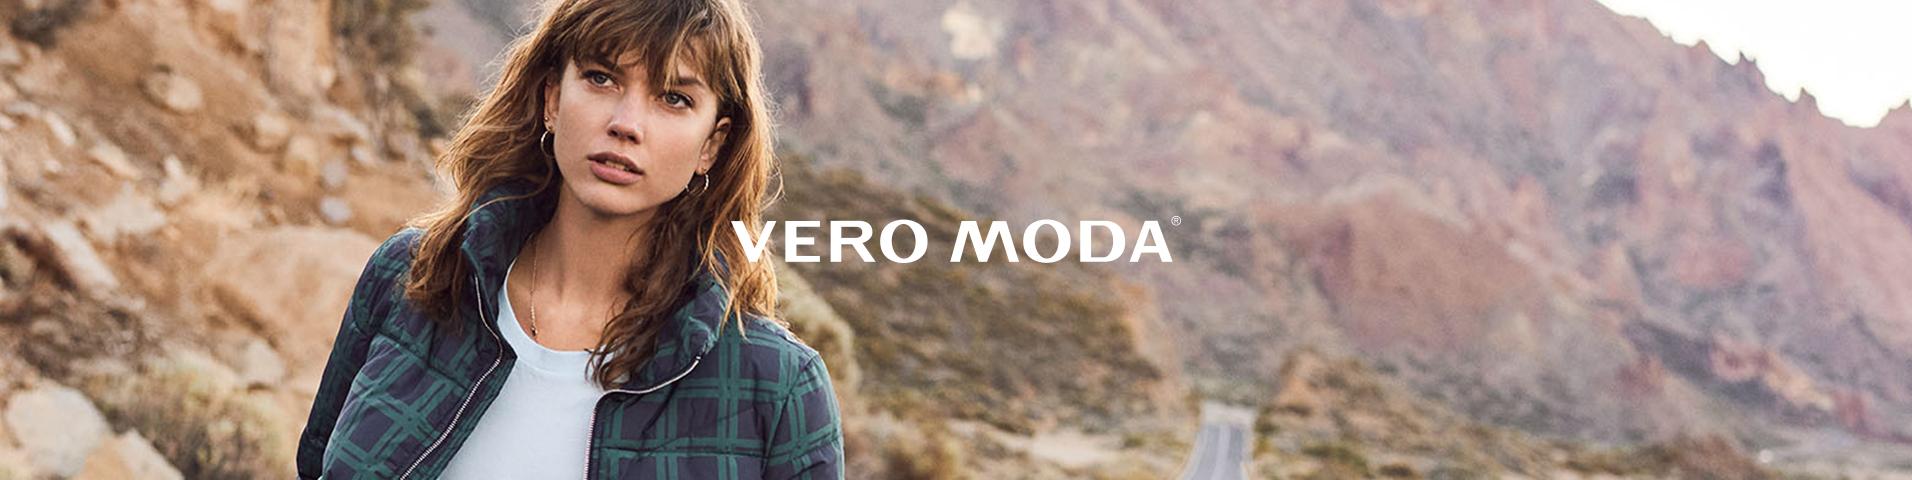 timeless design b138c cea2f Vero Moda Sneaker online kaufen | Mach's dir bequem | ZALANDO